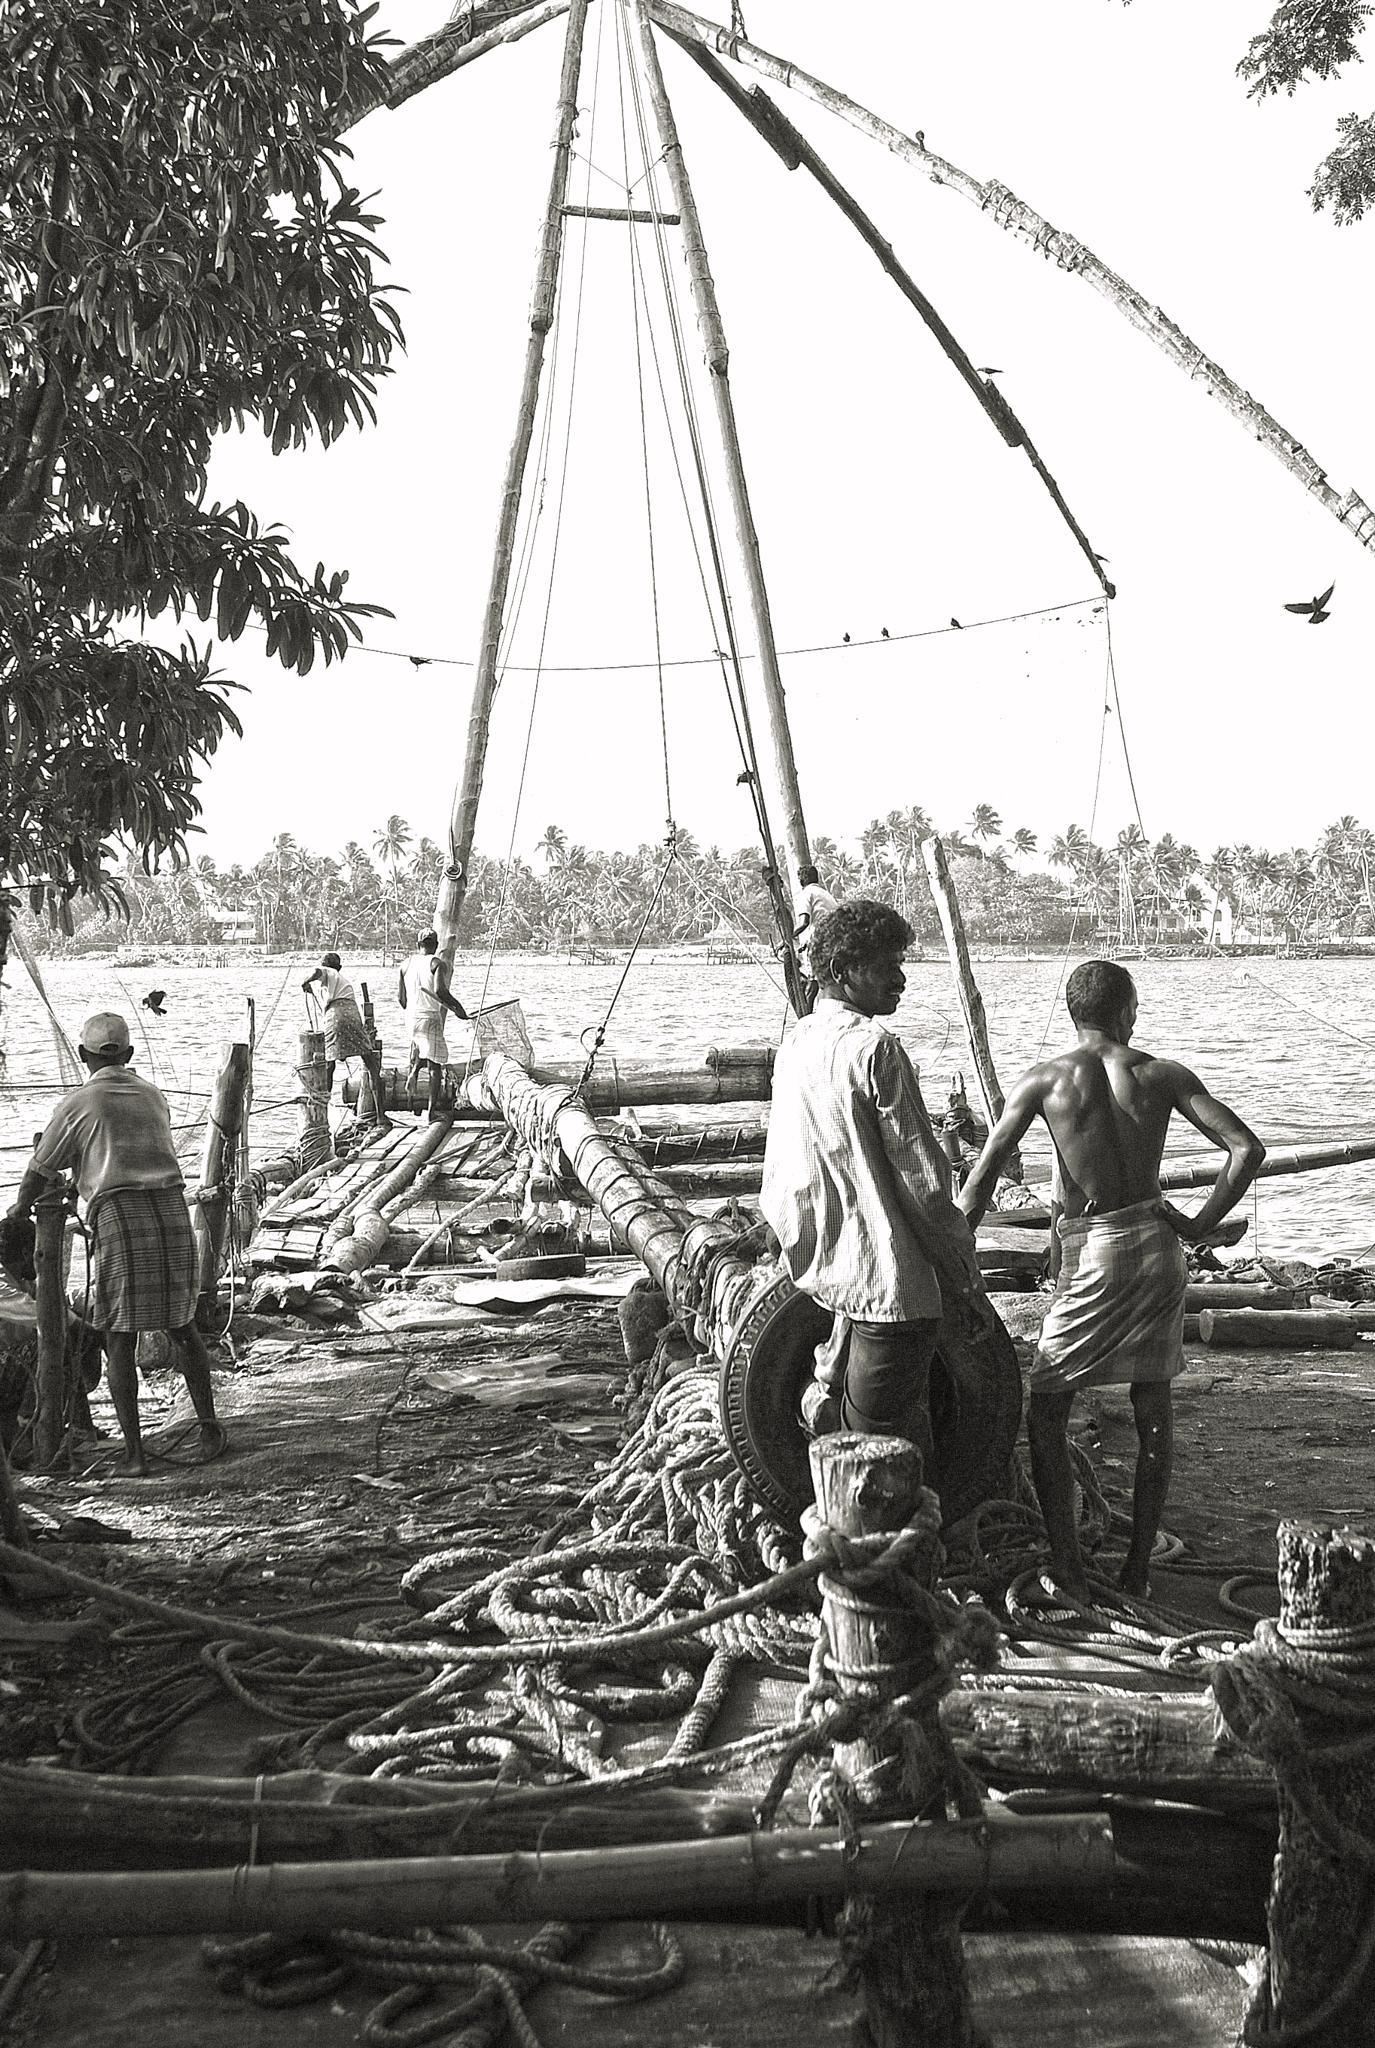 Fishermen in Cochin by Thierry Thévenet